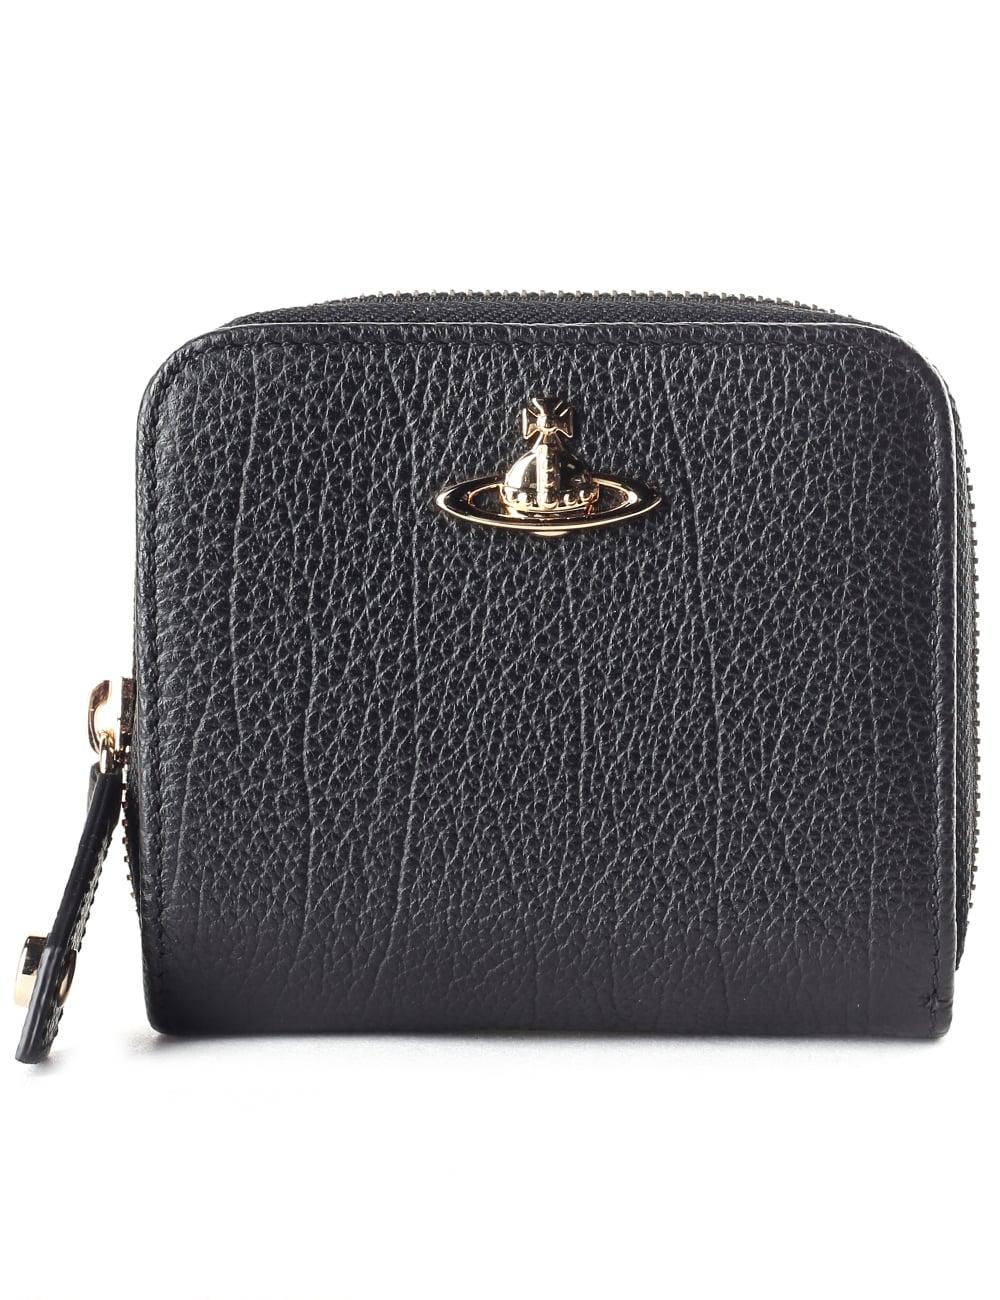 4313dae63d Vivienne Westwood Women's Medium Zip Around Balmoral Wallet